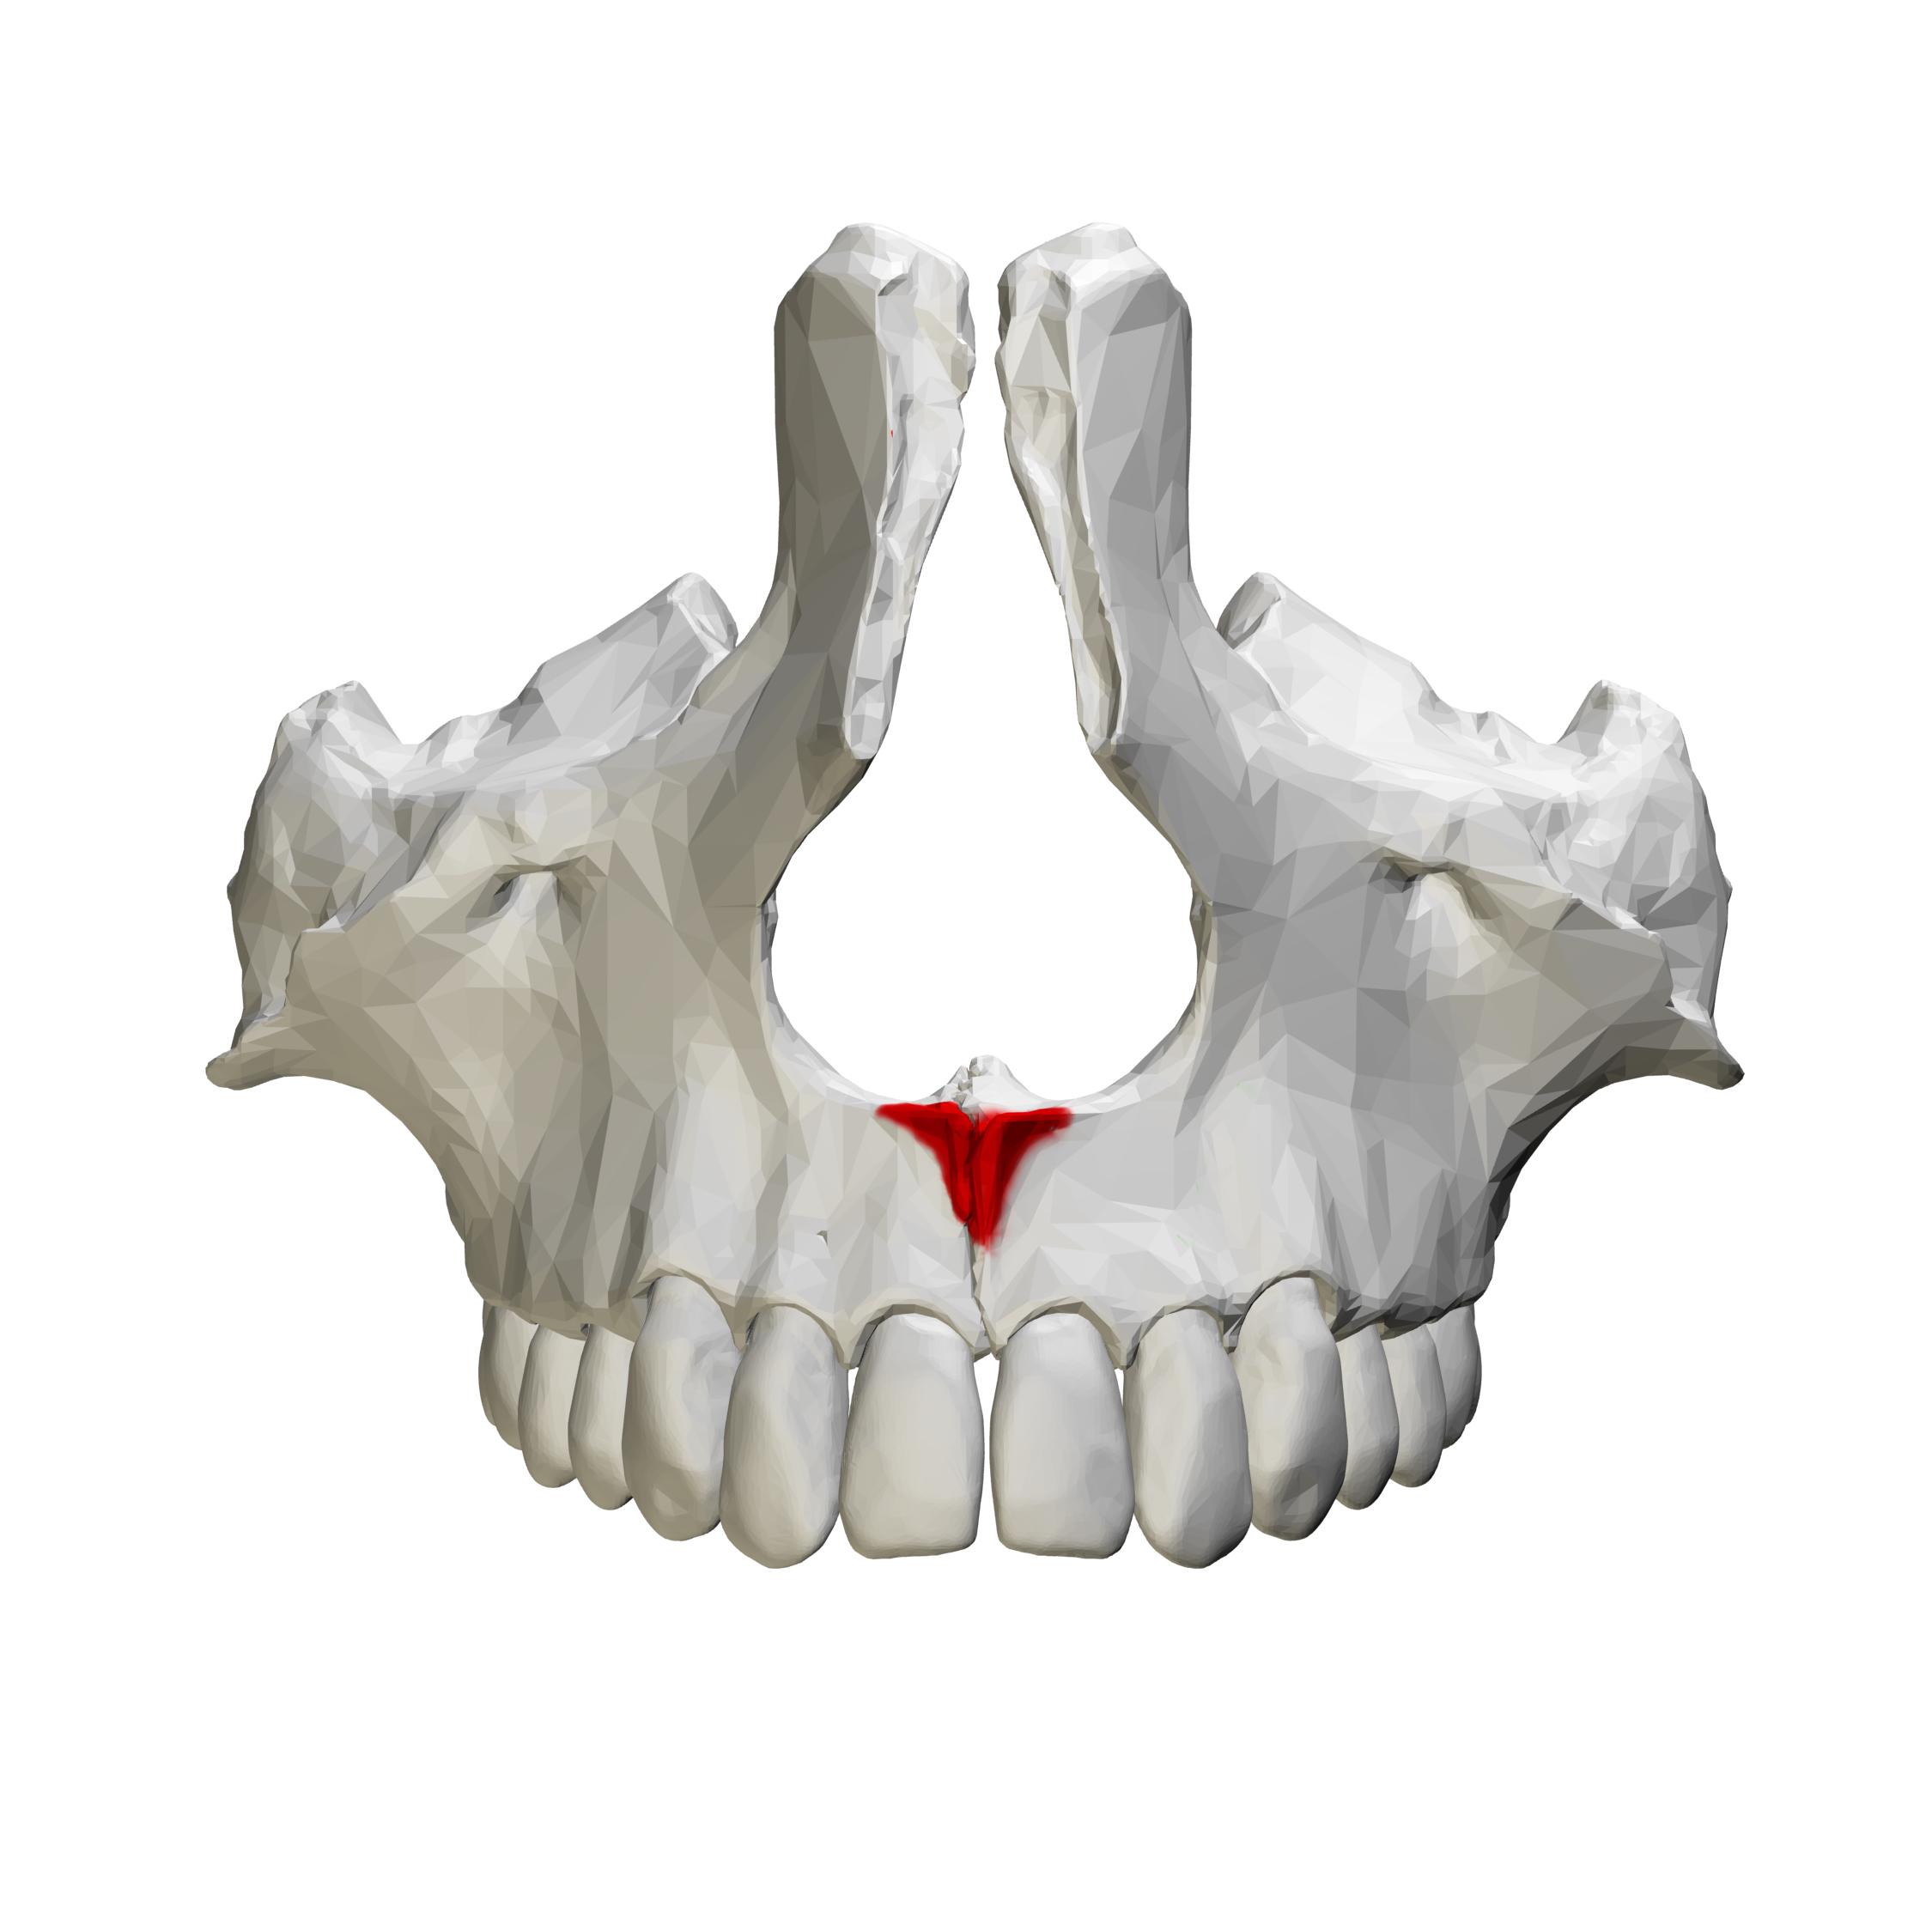 fileanterior nasal spine of maxilla close up anterior viewpng